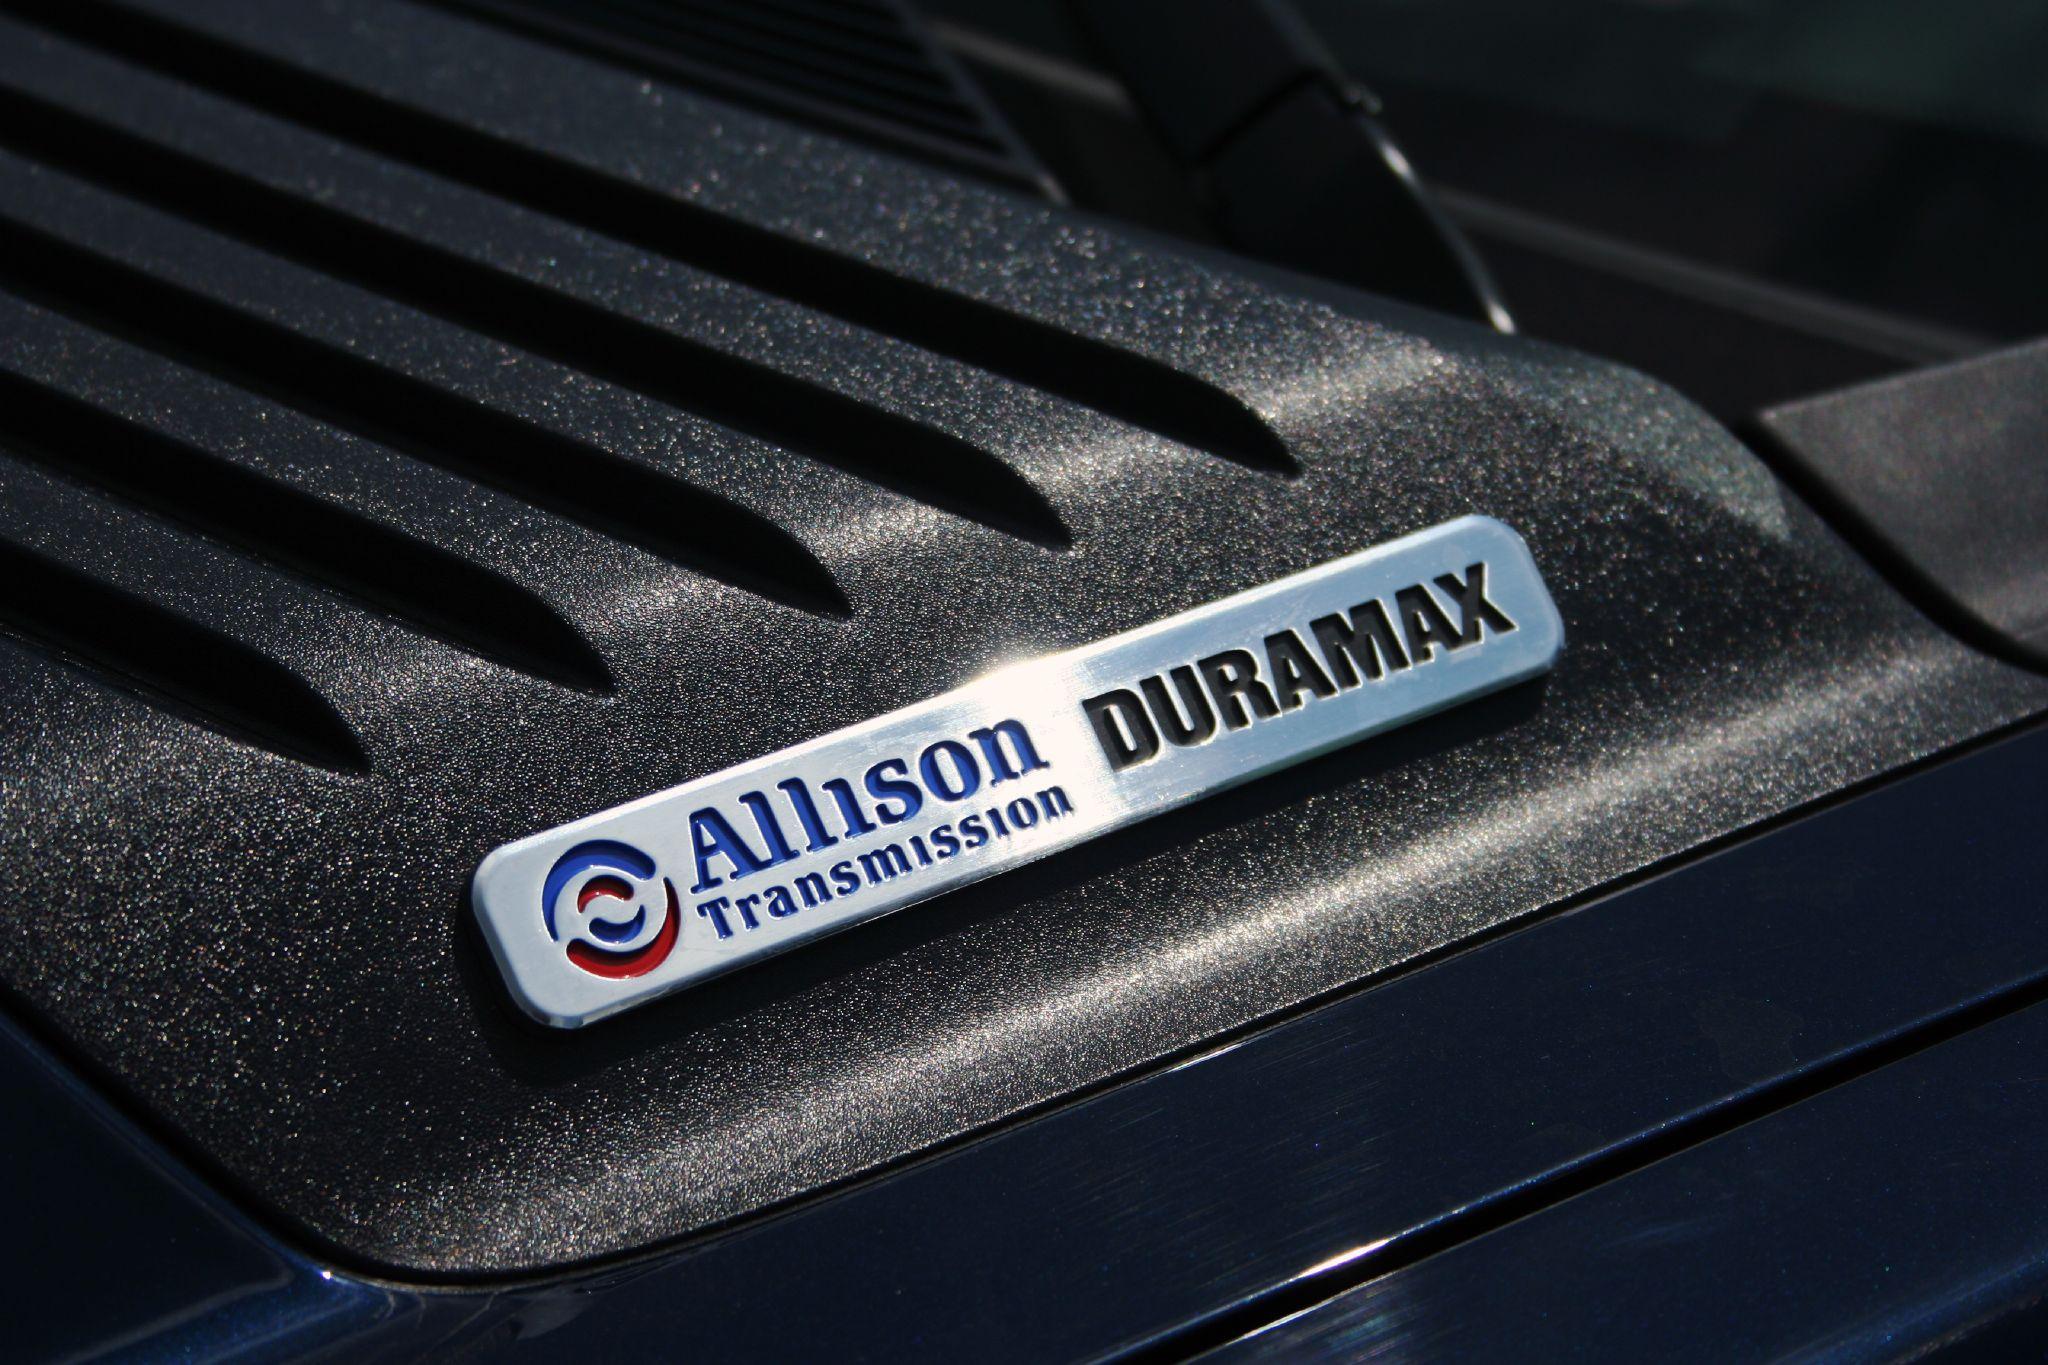 2004 chevrolet duramax diesel tranny cooler